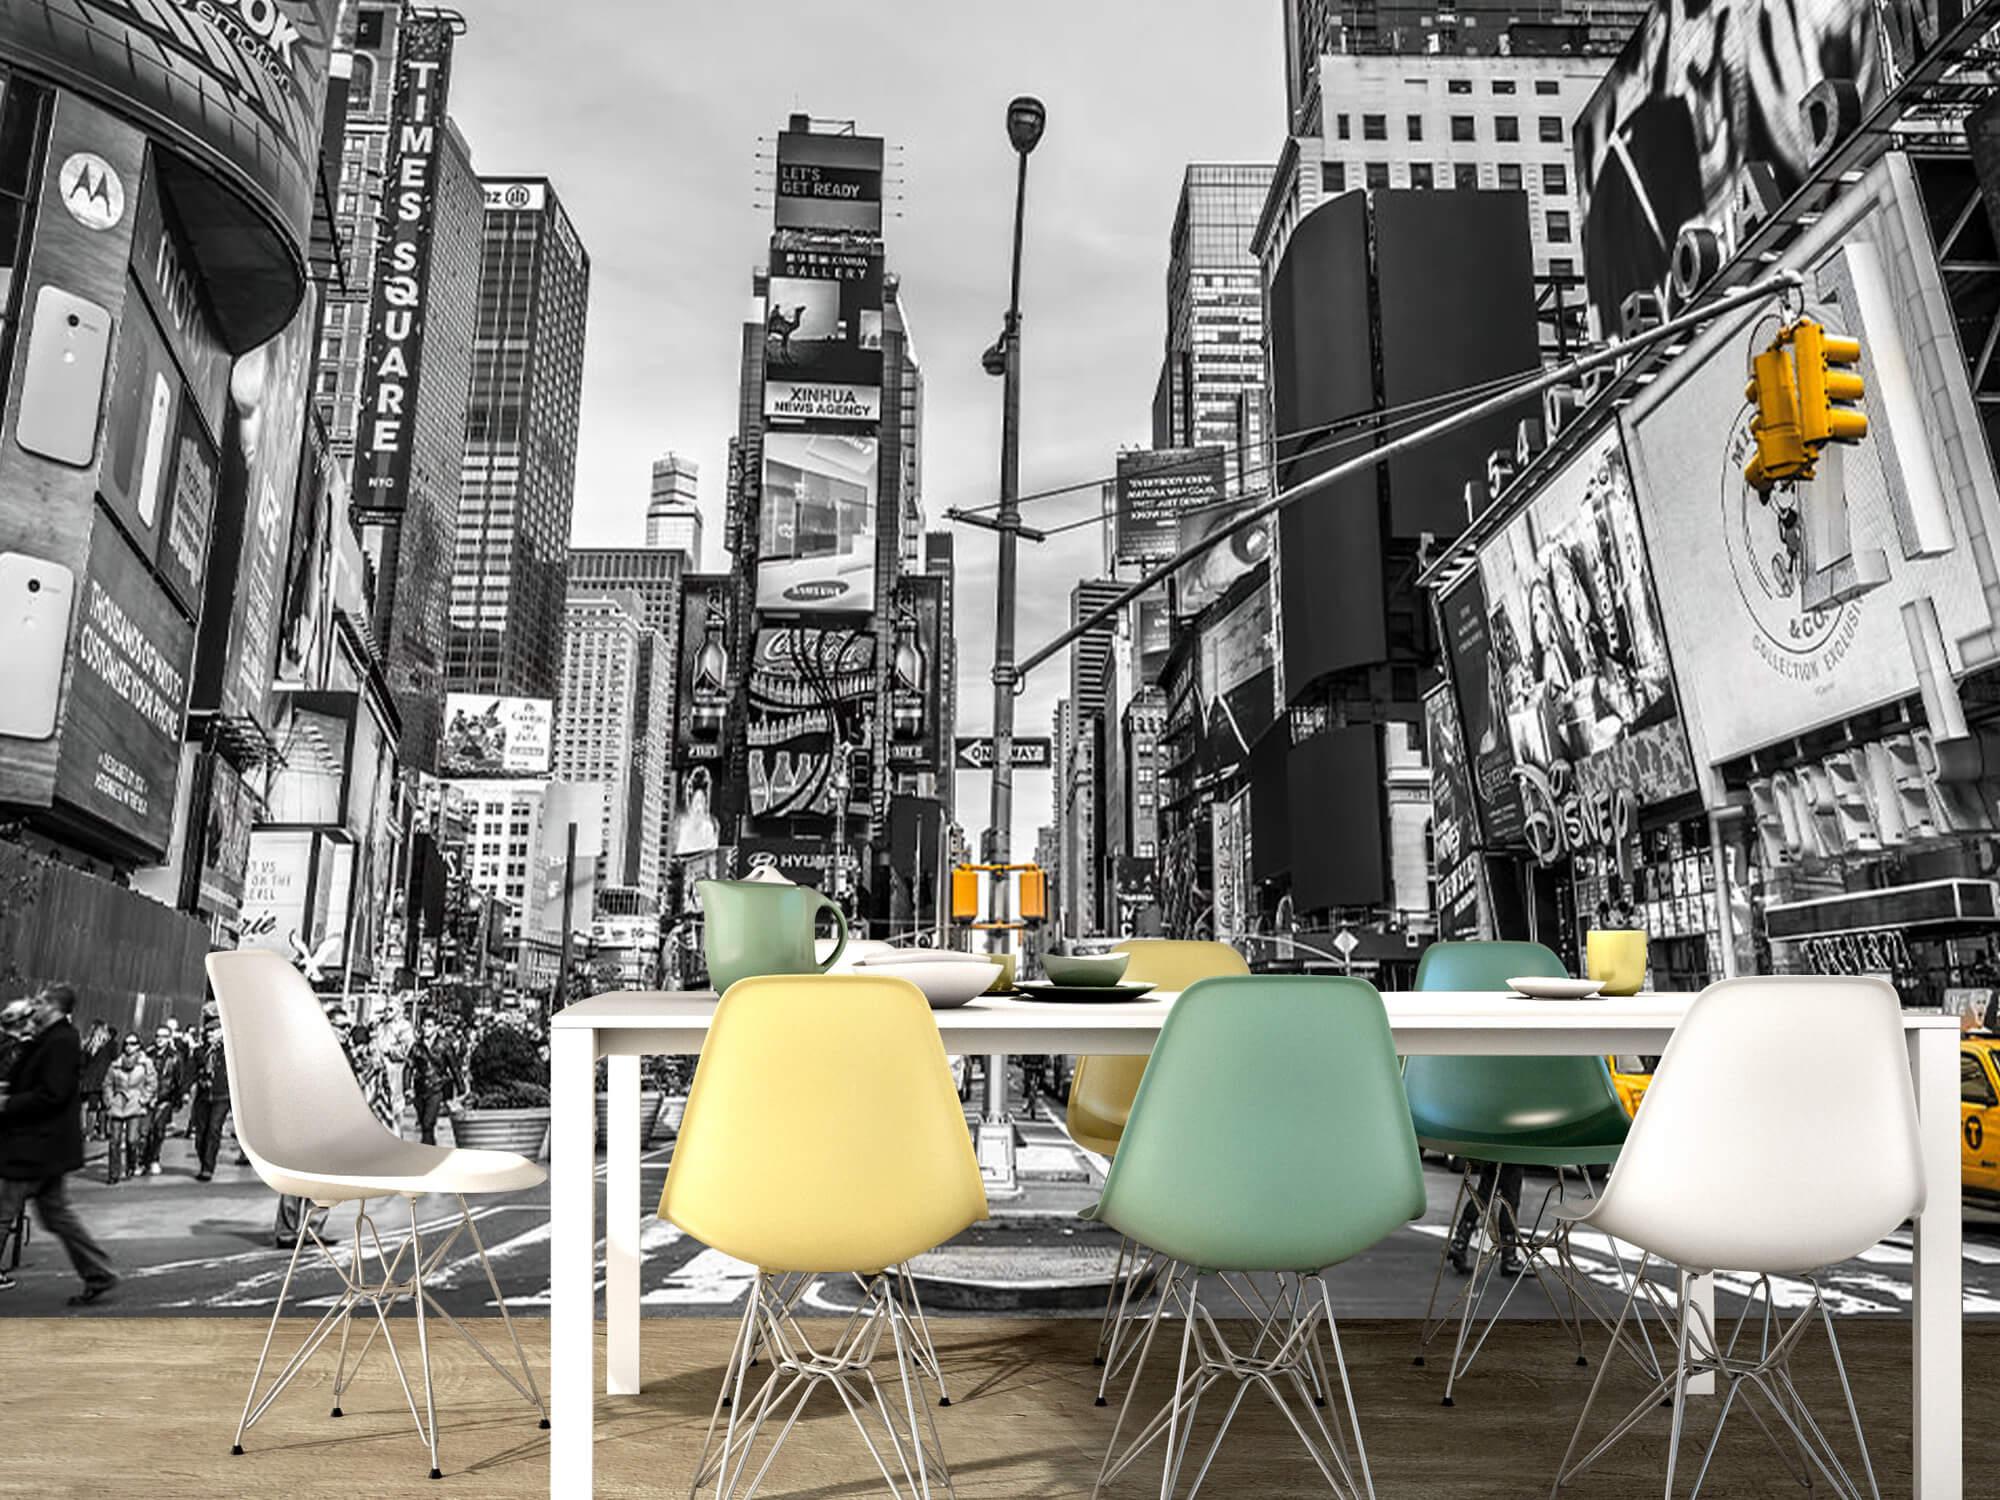 Broadway Times Square 12